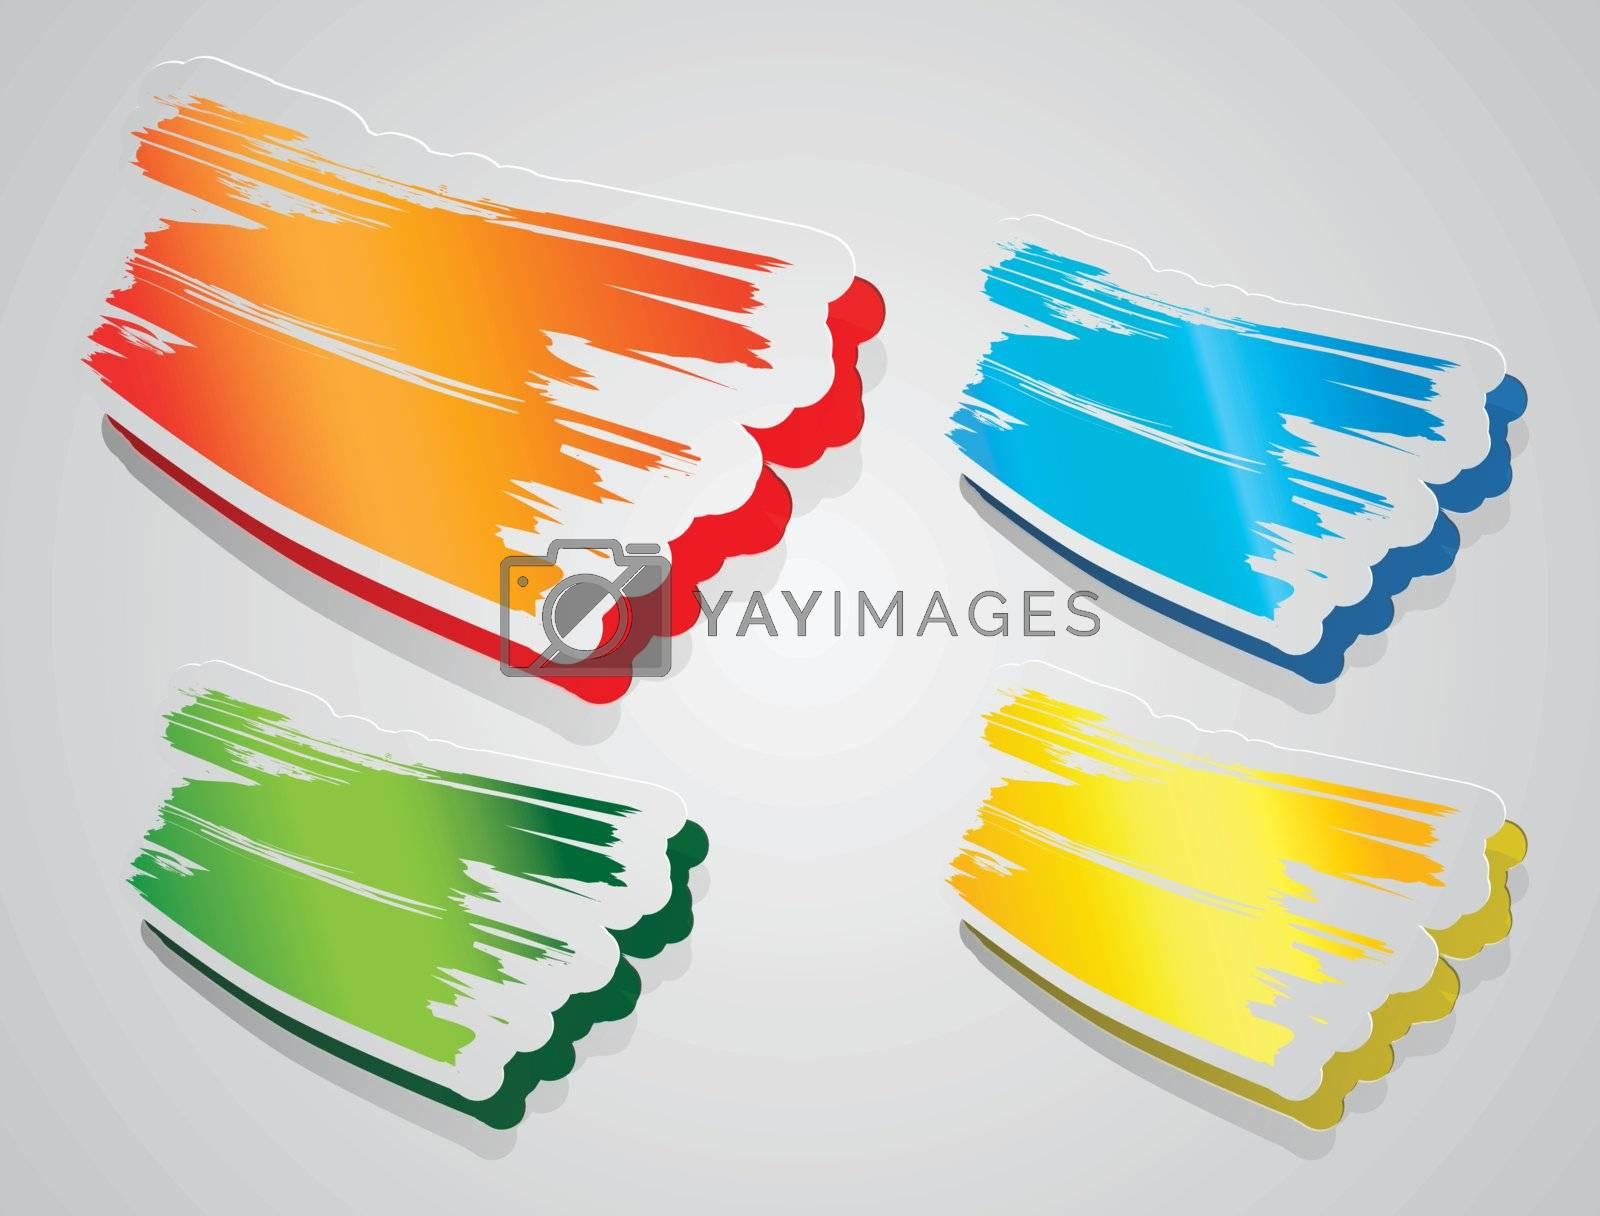 Colorful sticker paper brush stroke